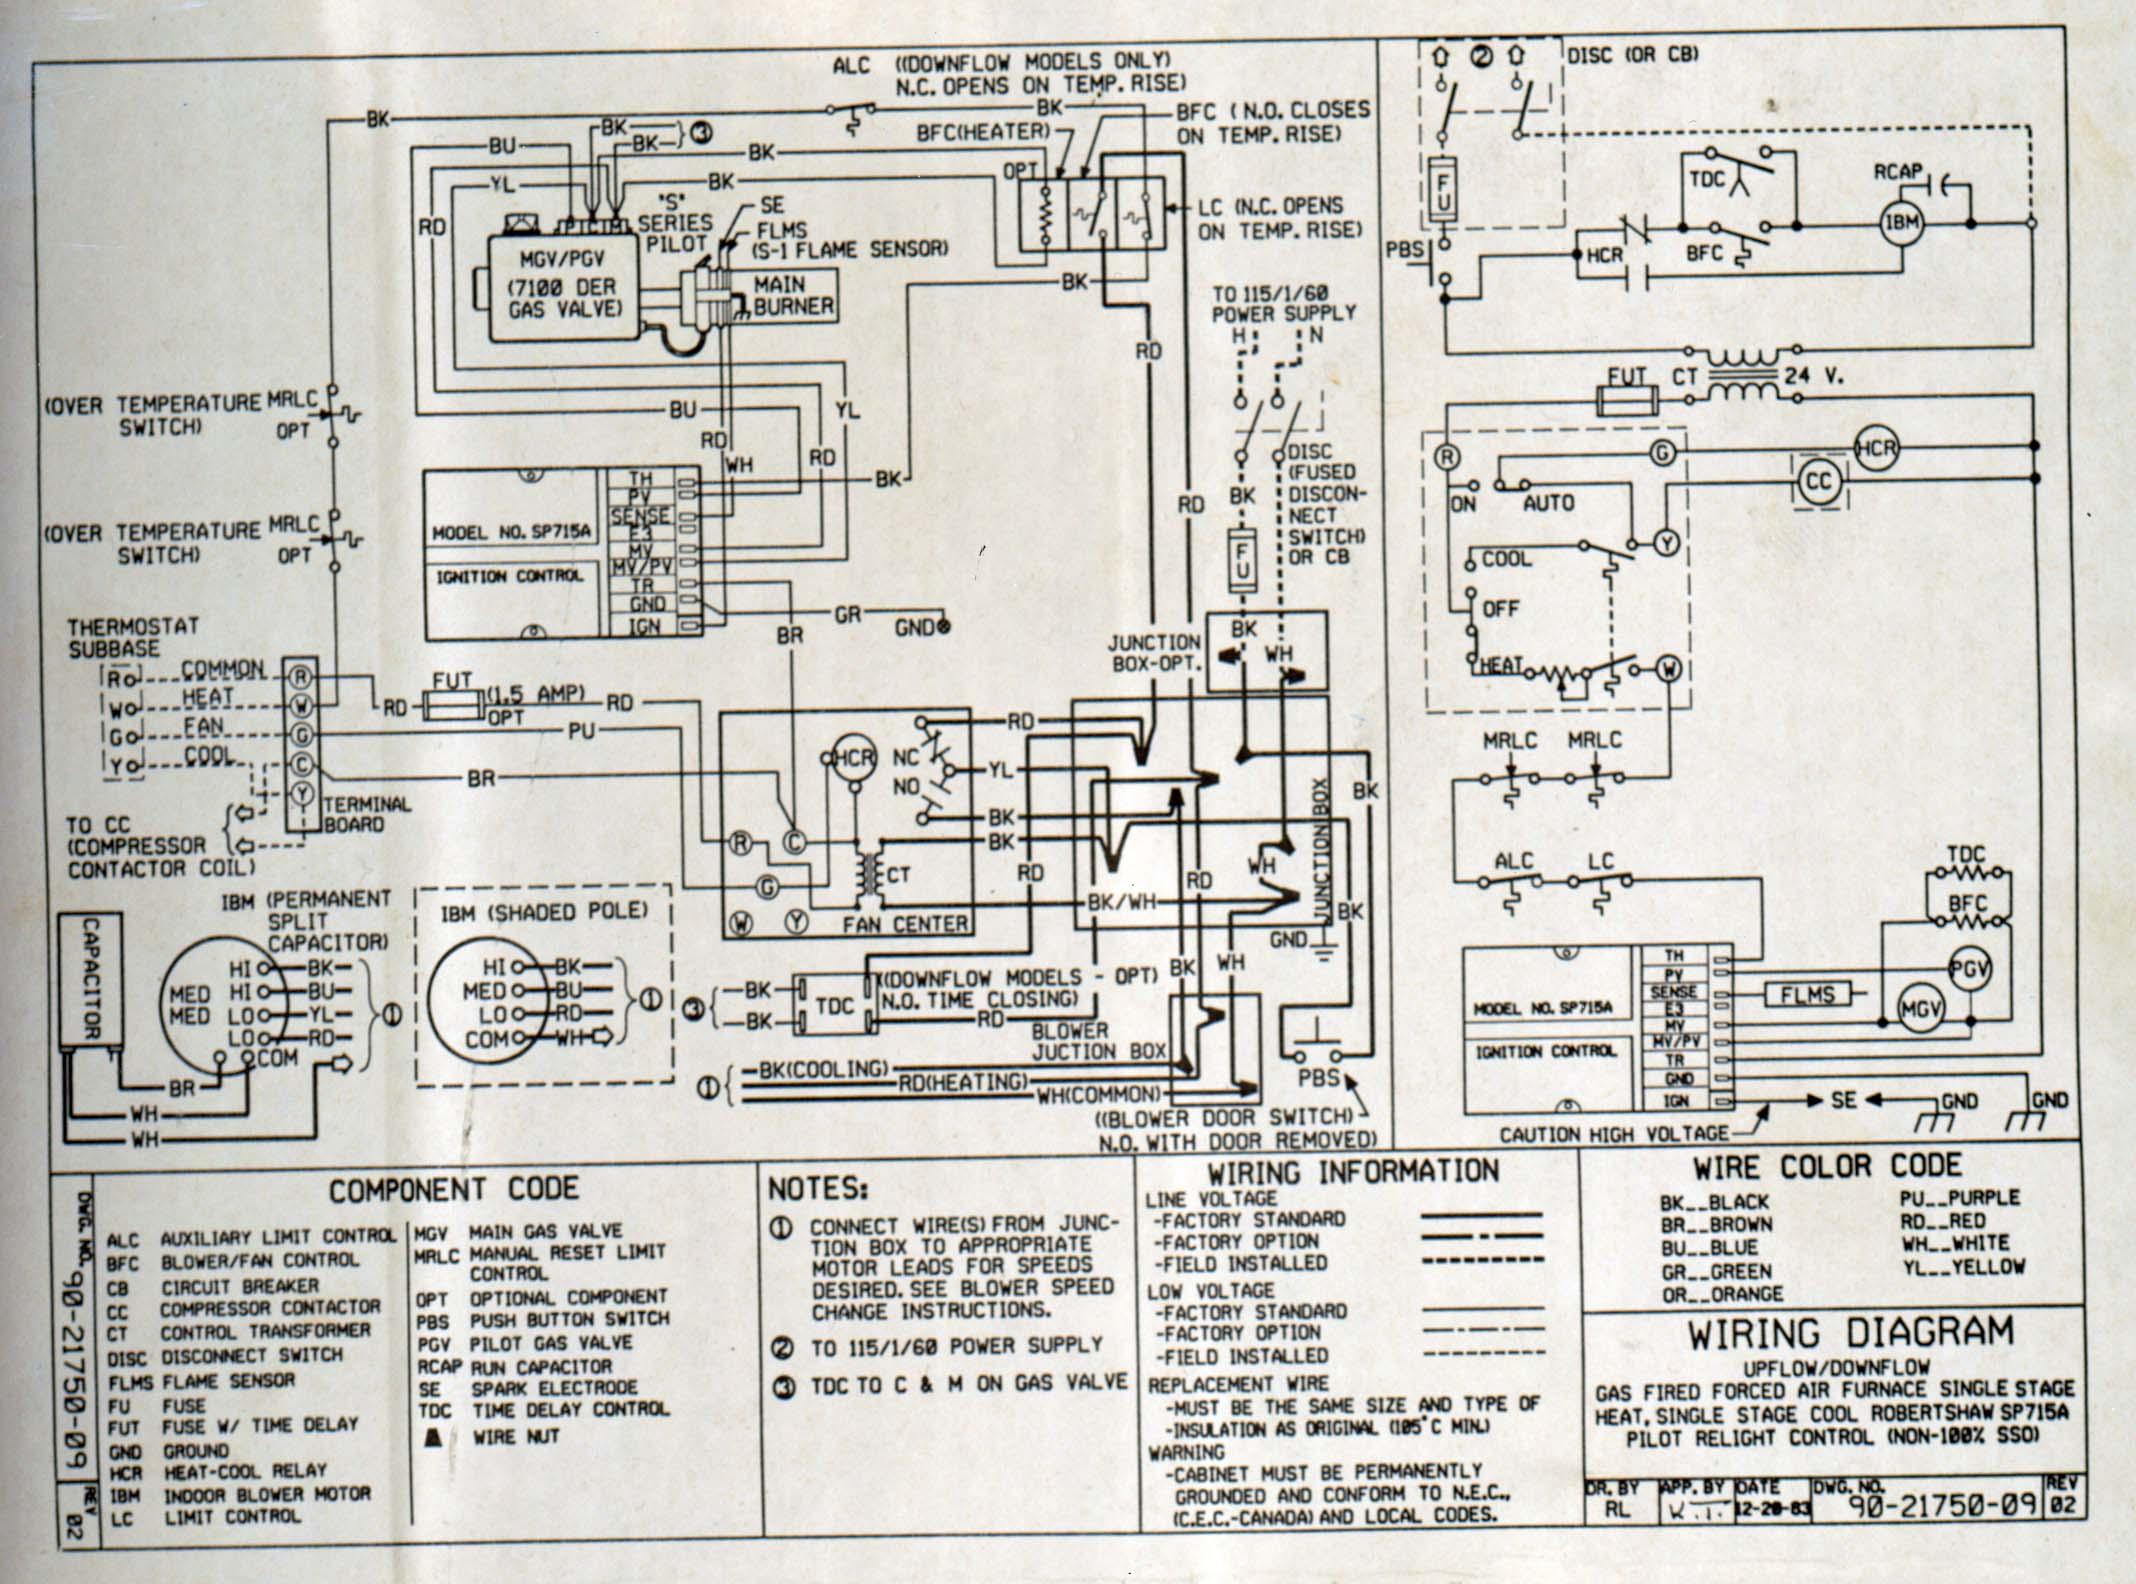 E1Eb 015Ha Wiring Diagram from schematron.org